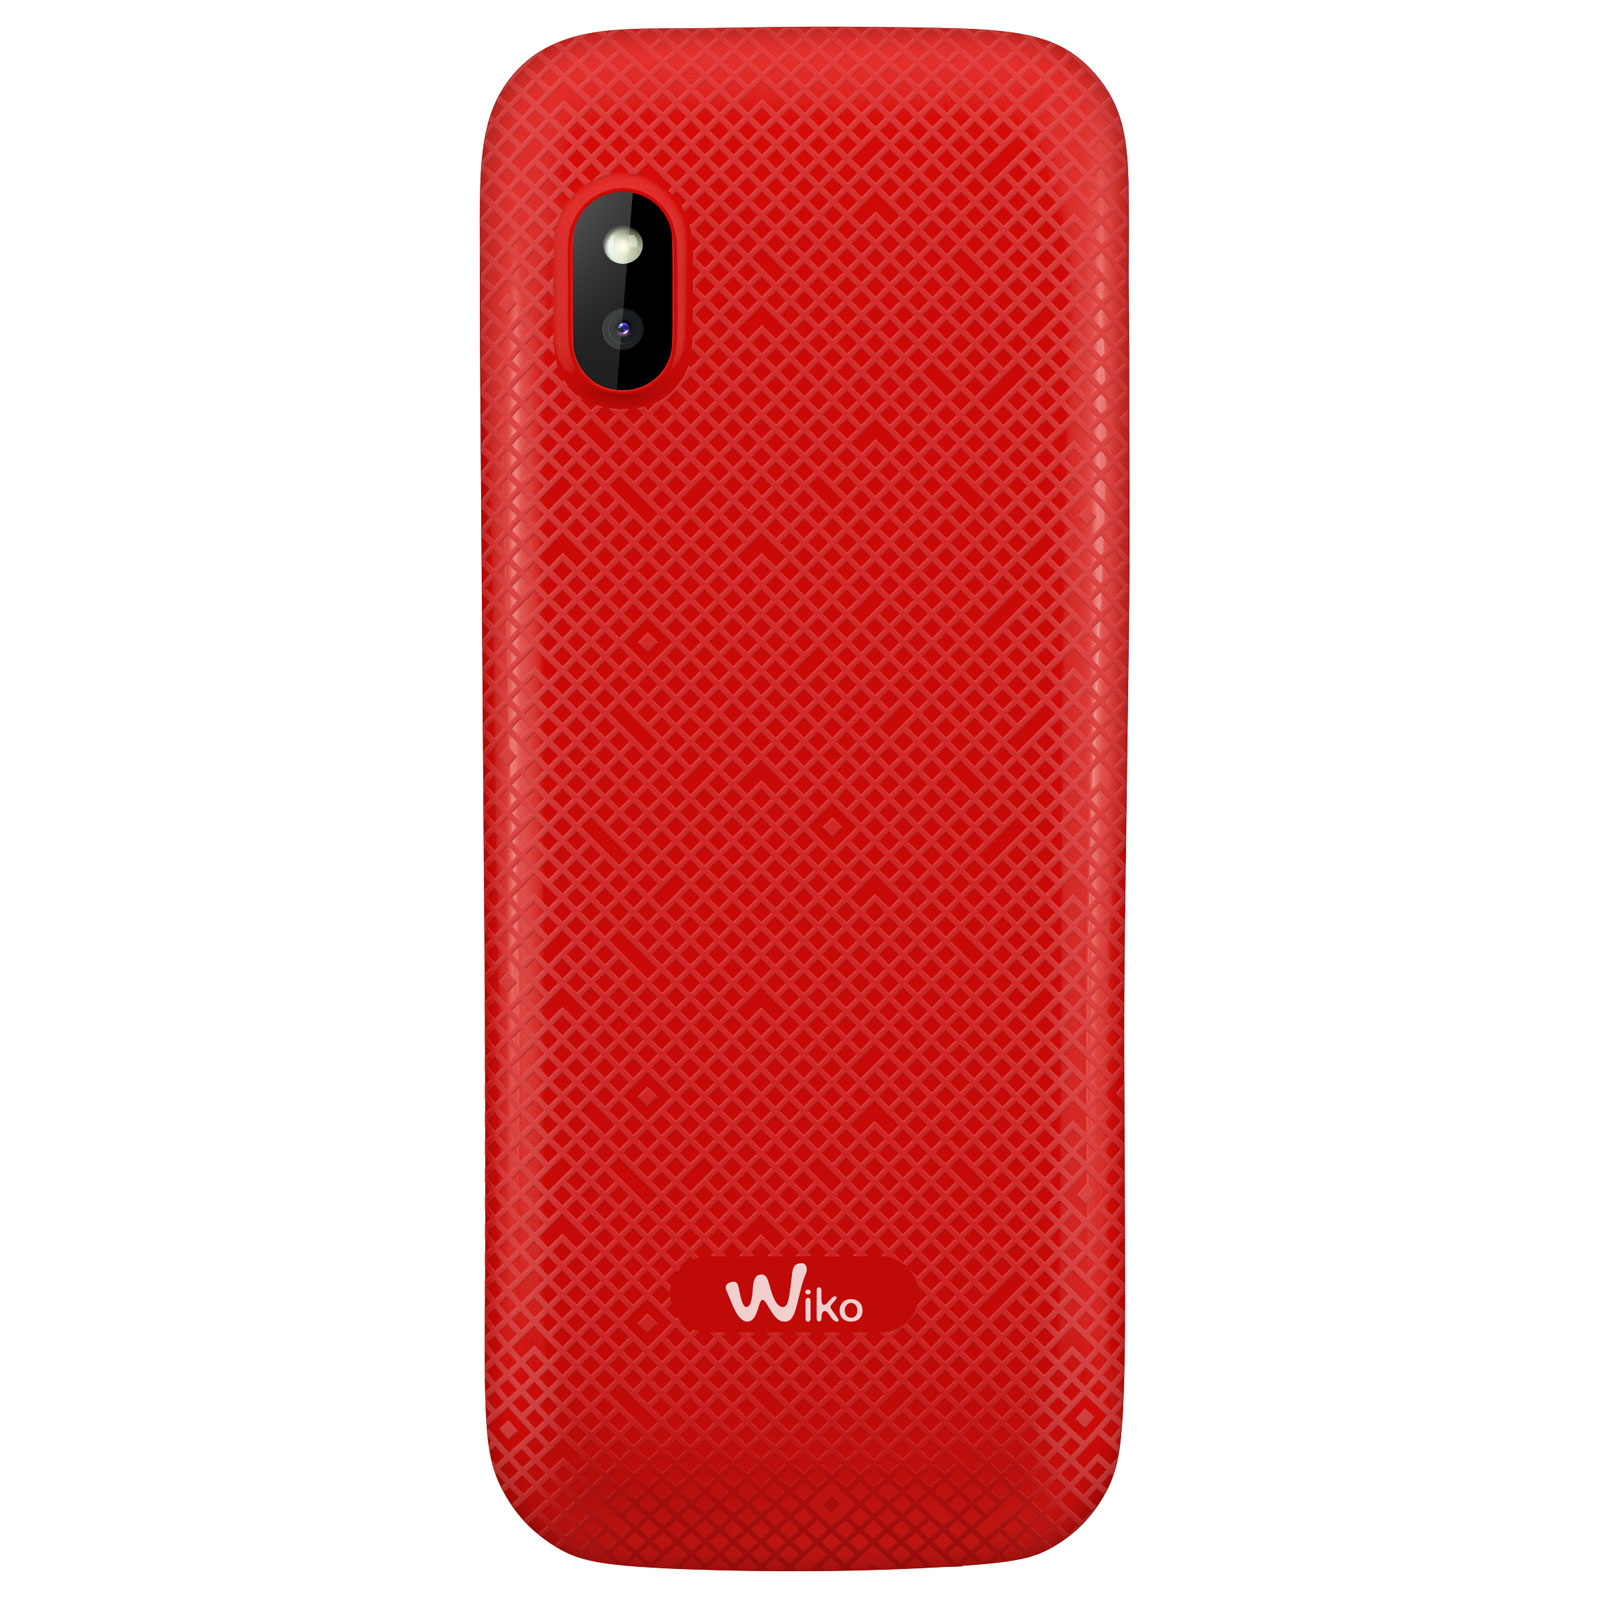 Wiko lubi 3 rouge mobile smartphone wiko sur for Photo ecran wiko